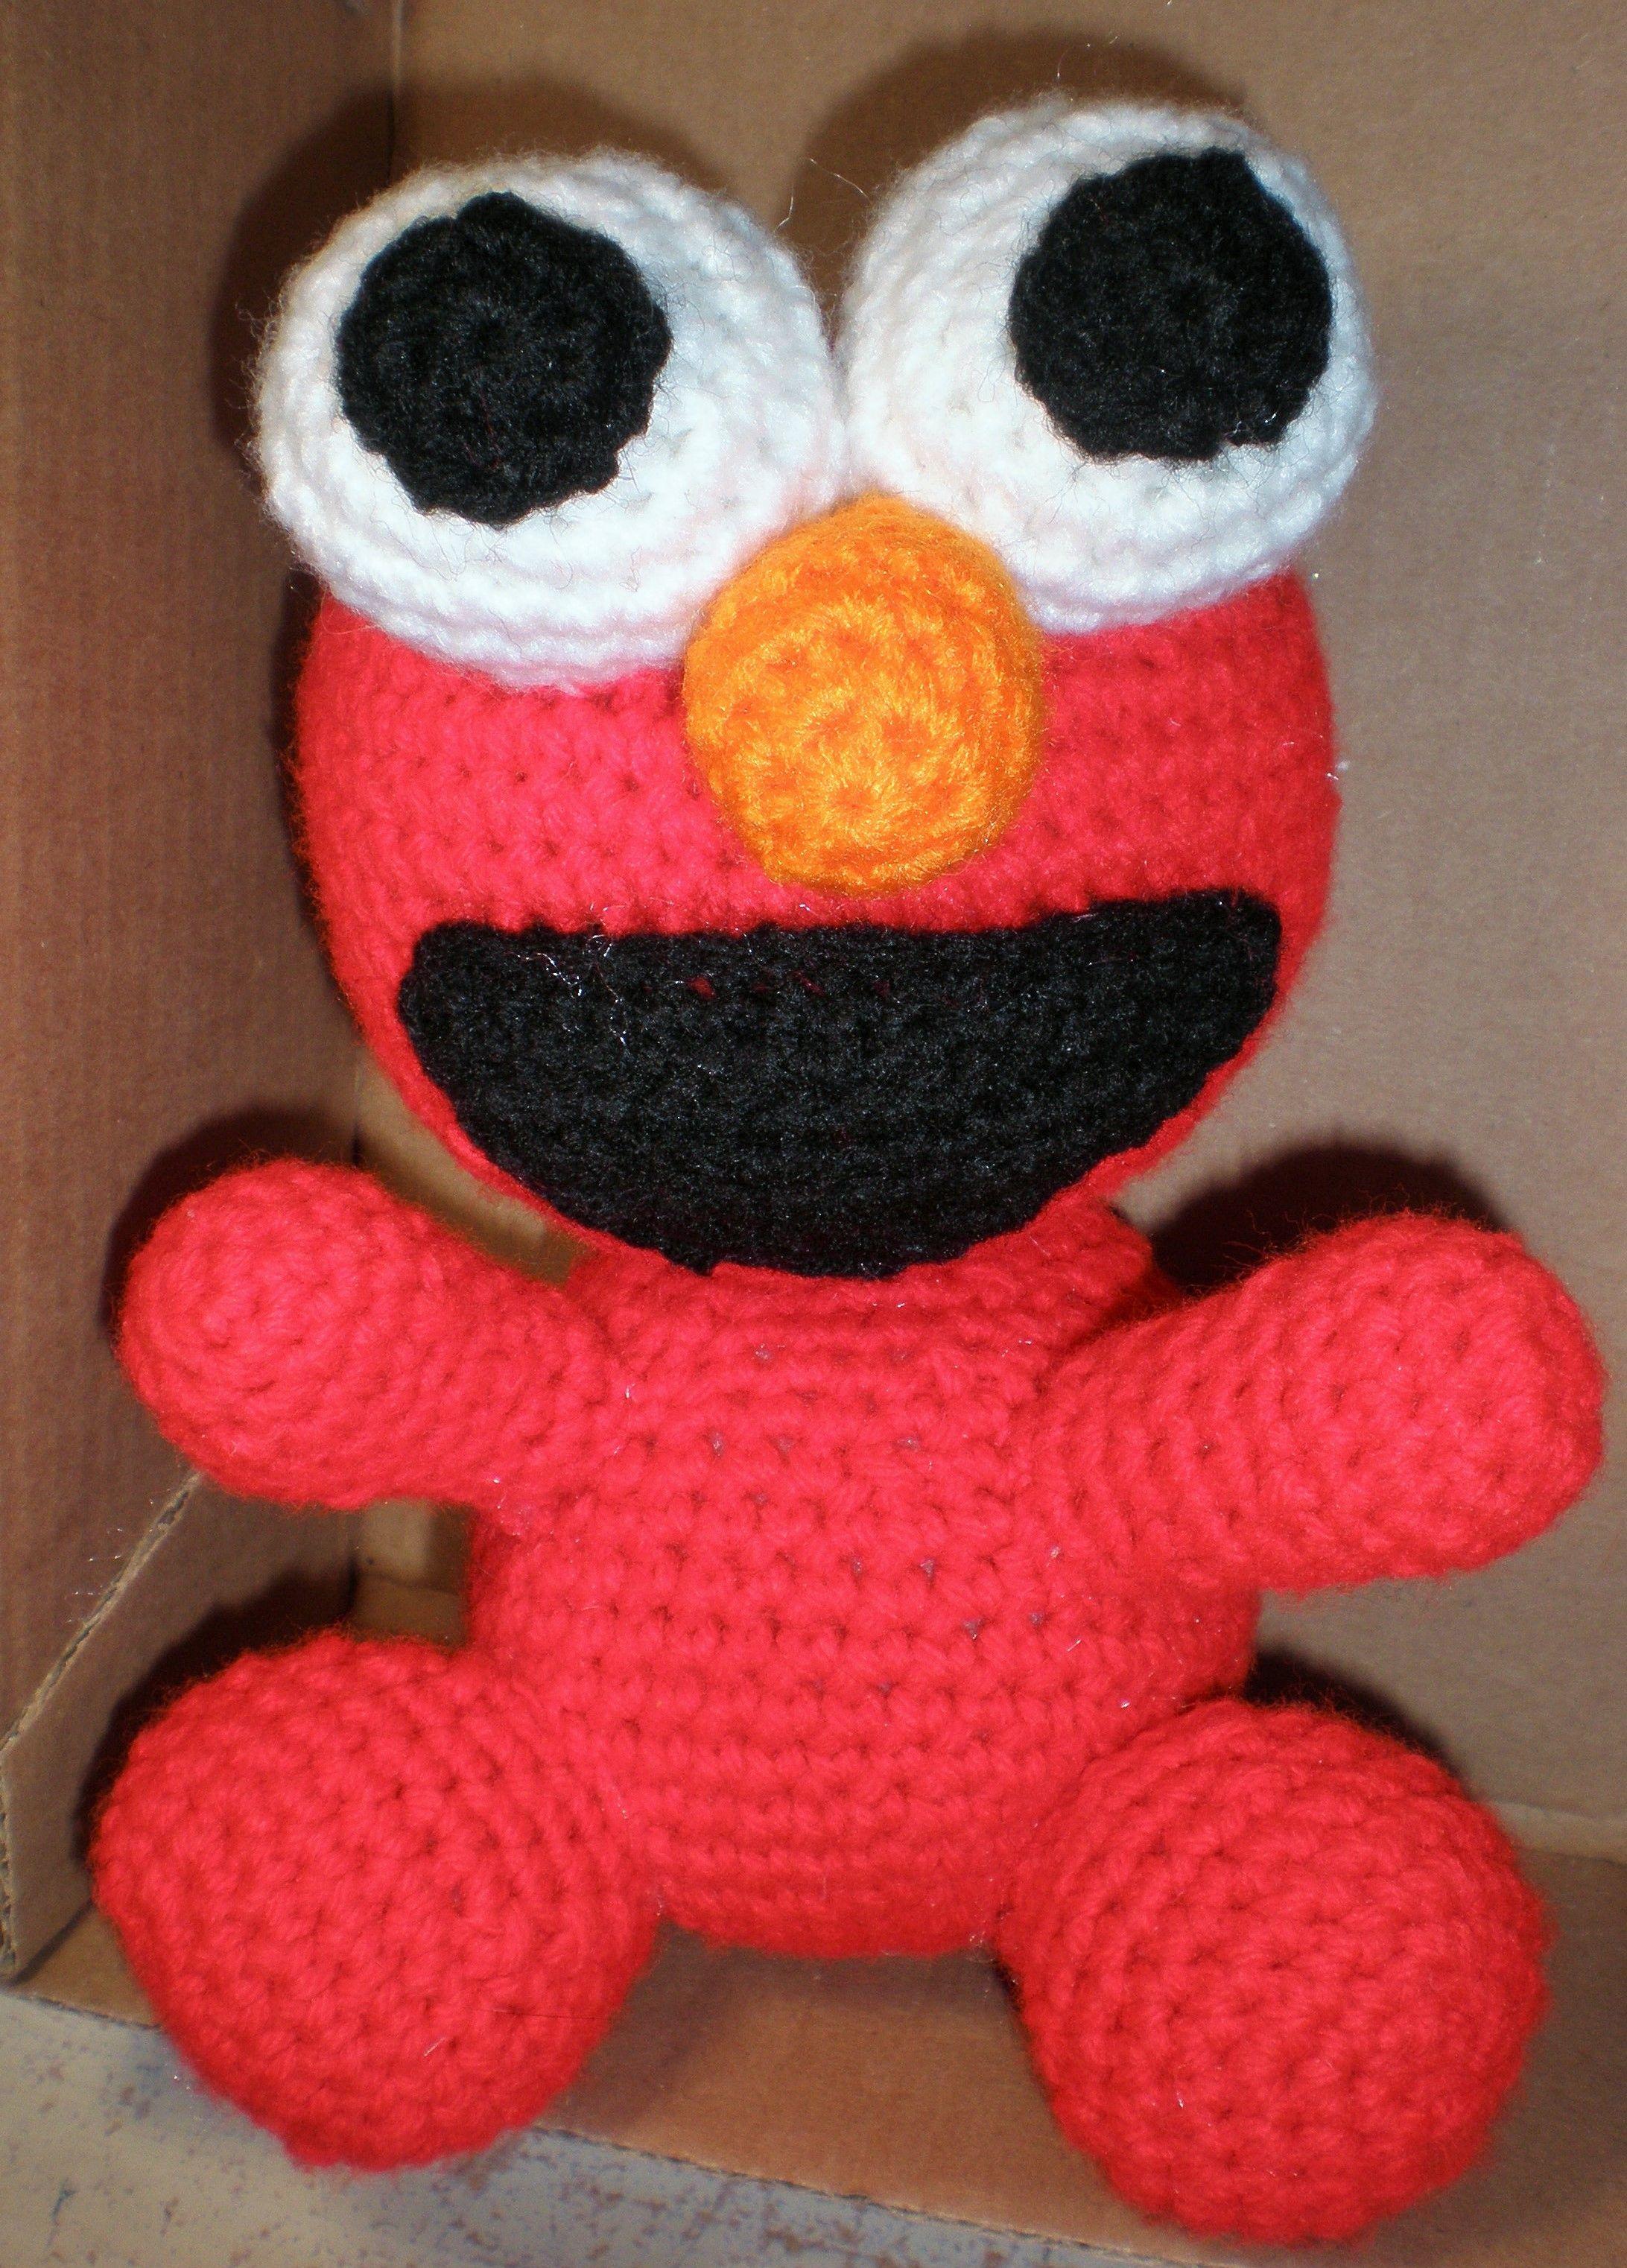 Sesame Street Elmo Inspired Baby Hat Crochet Pattern - Others ... | 3044x2184